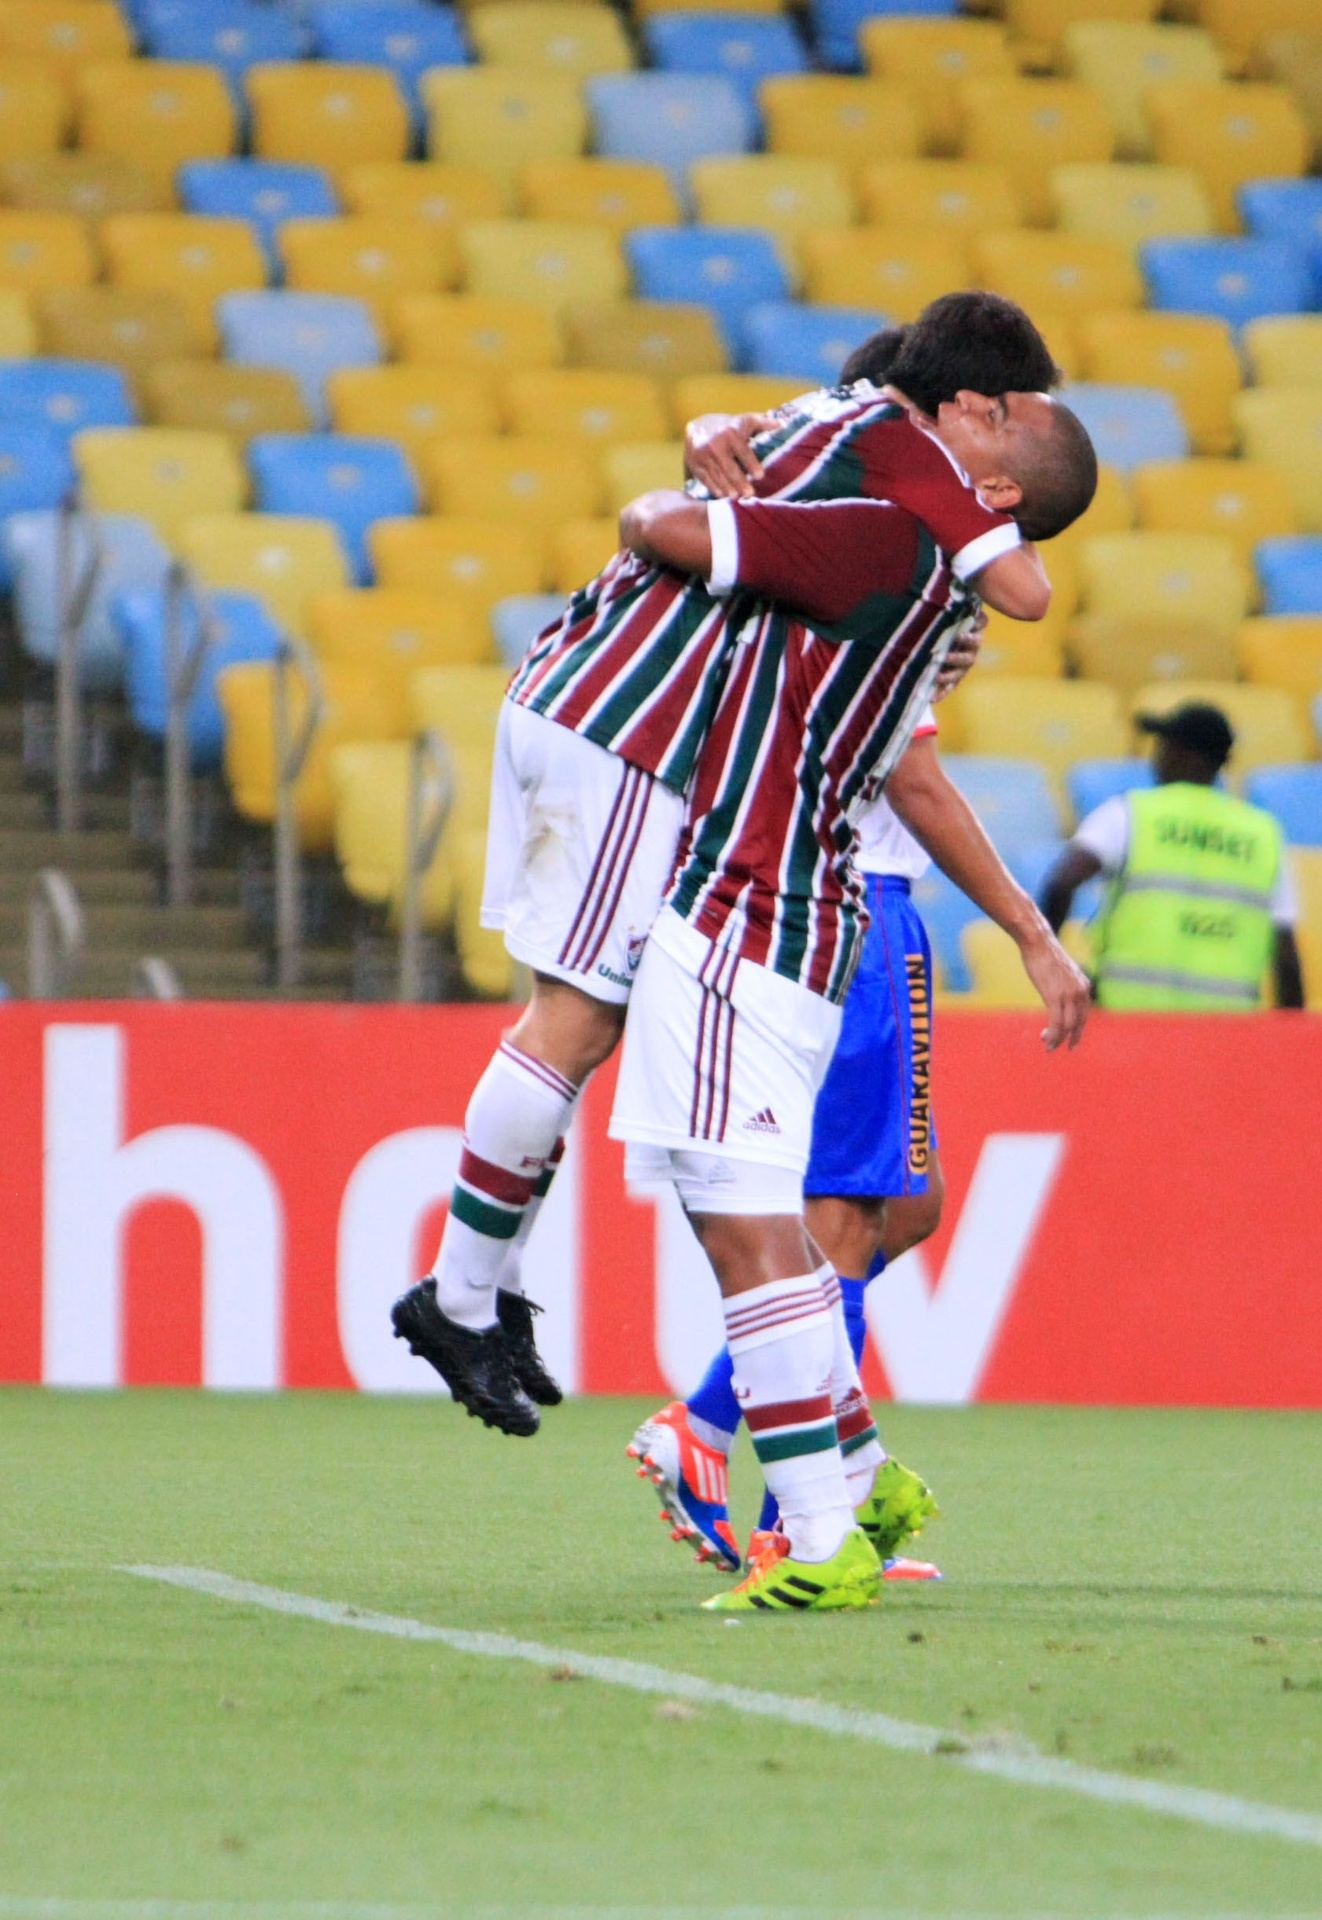 05.mar.2014 - Walter abraça Conca após o argentino marcar o segundo gol do Fluminense na partida contra o Friburguense